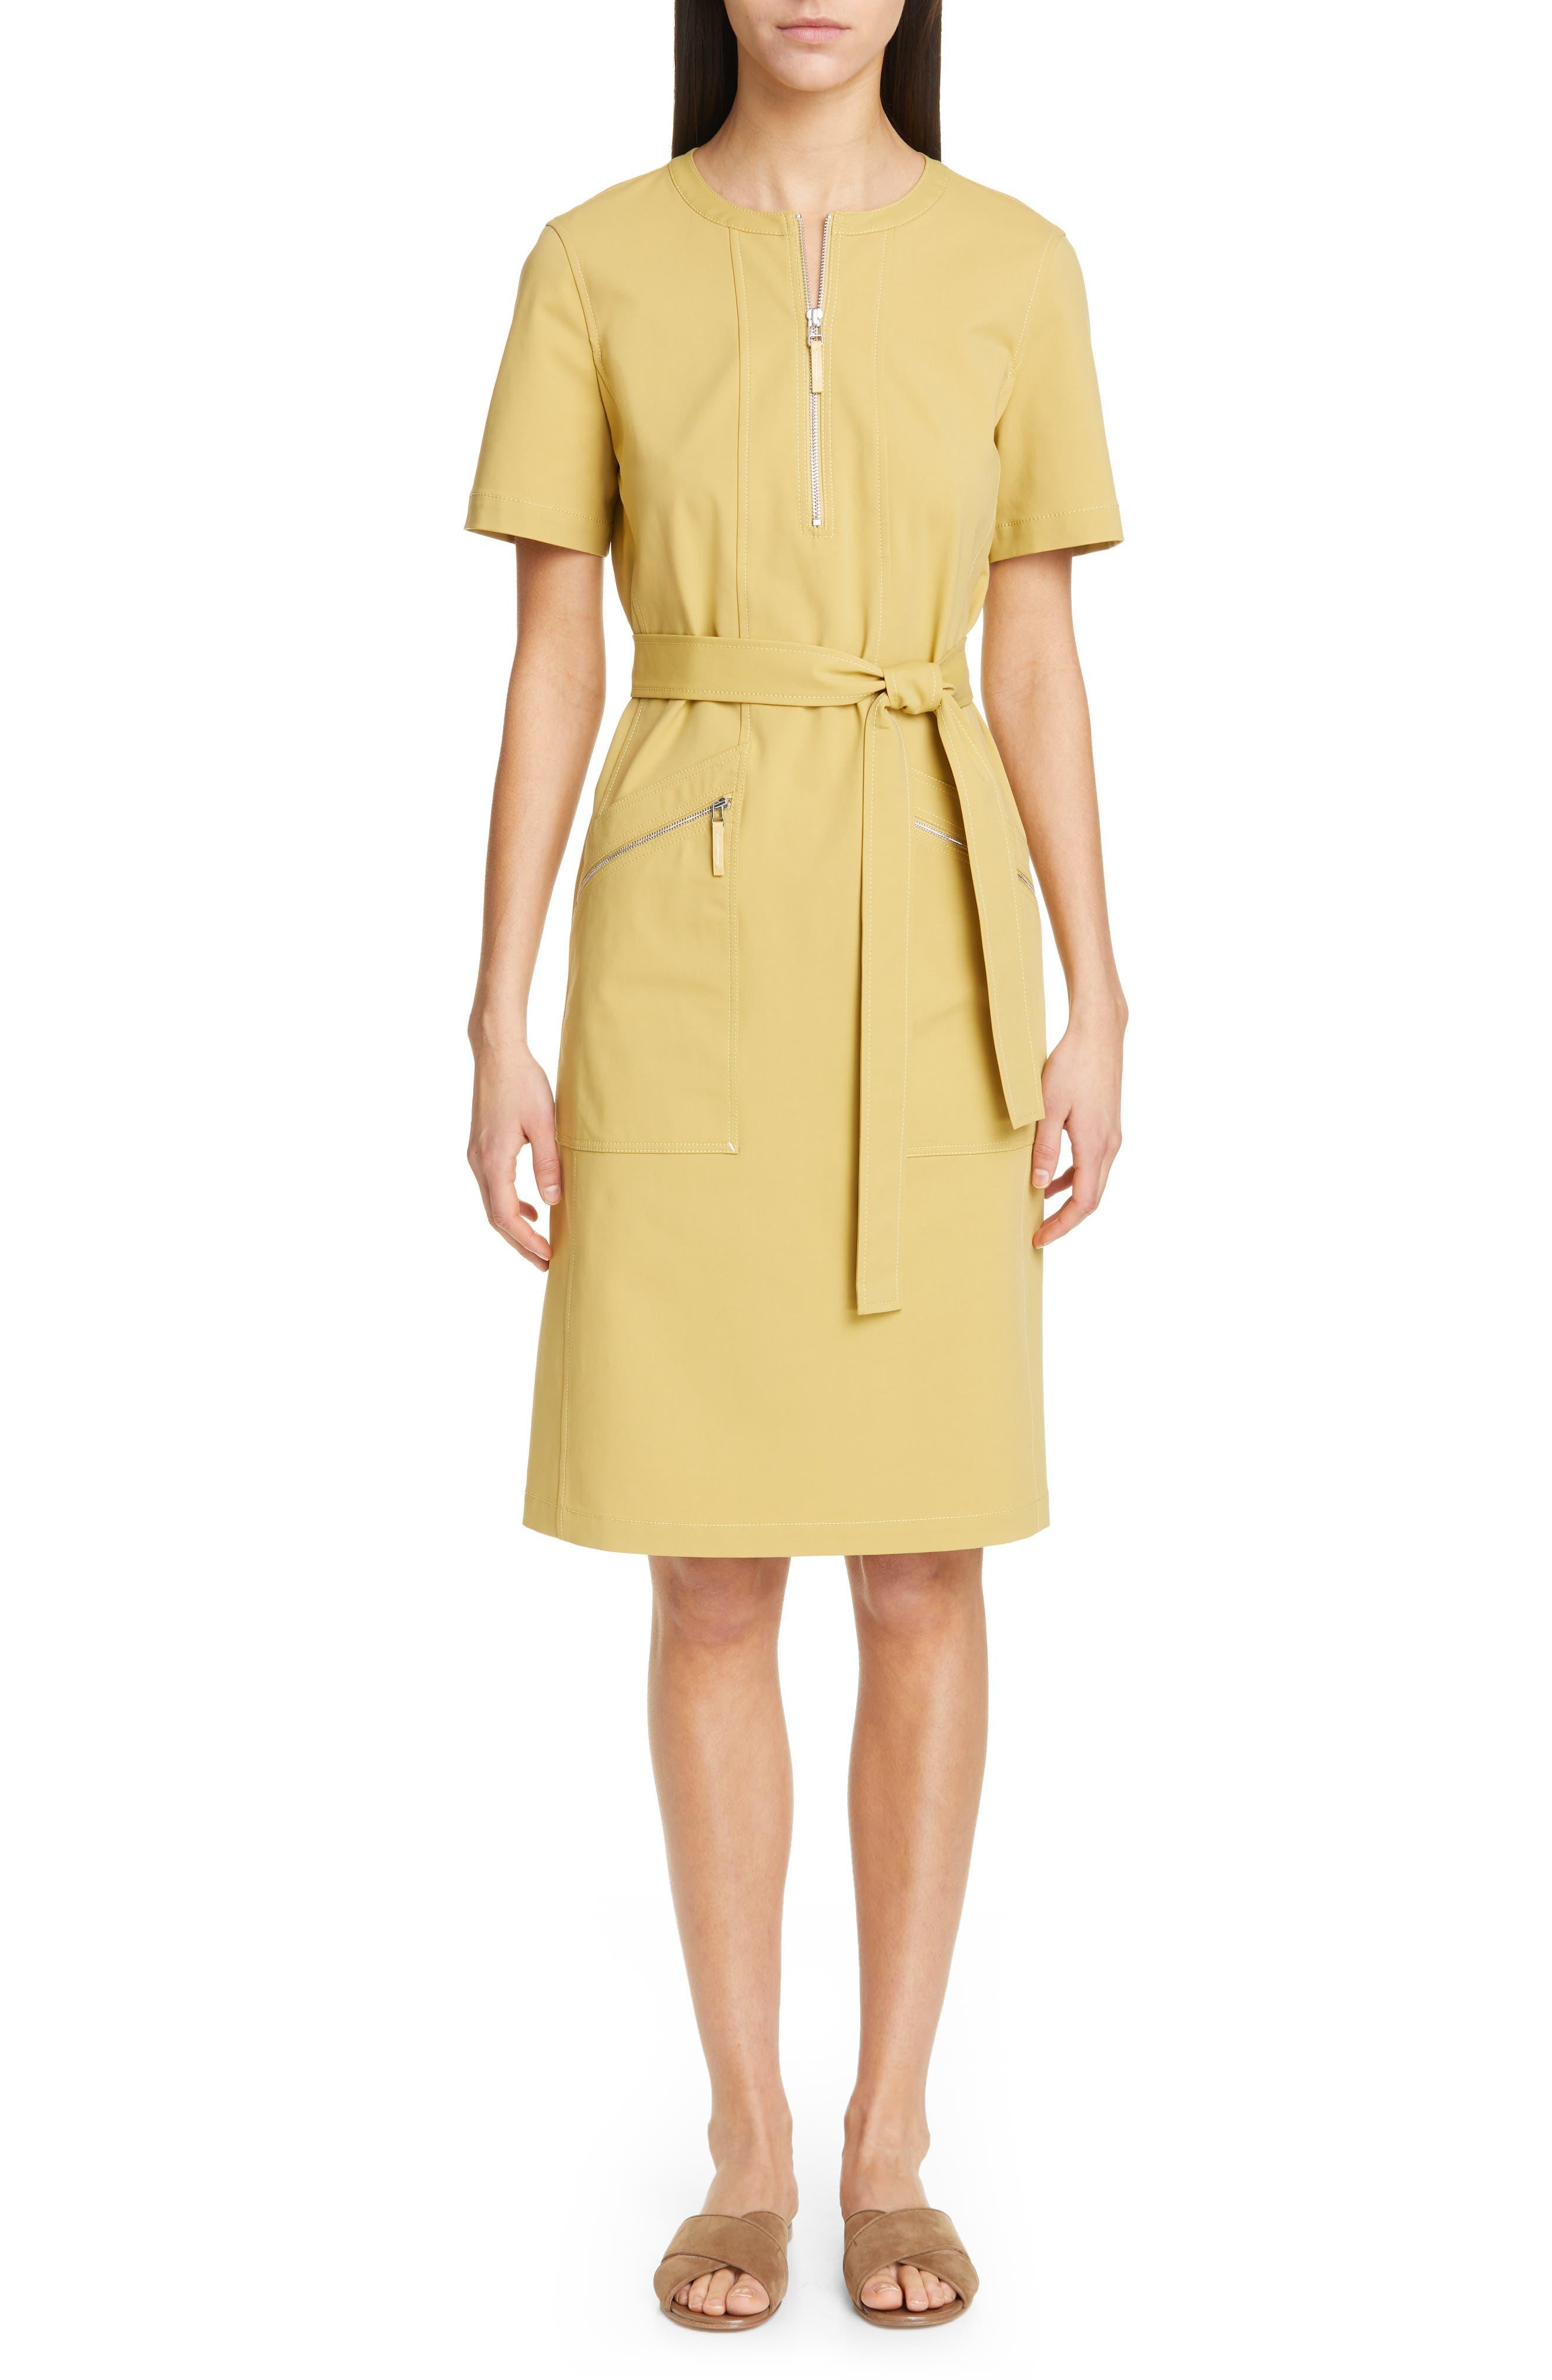 LAFAYETTE 148 NEW YORK, Elizabella Belted Dress, Main thumbnail 1, color, GREEN TEA